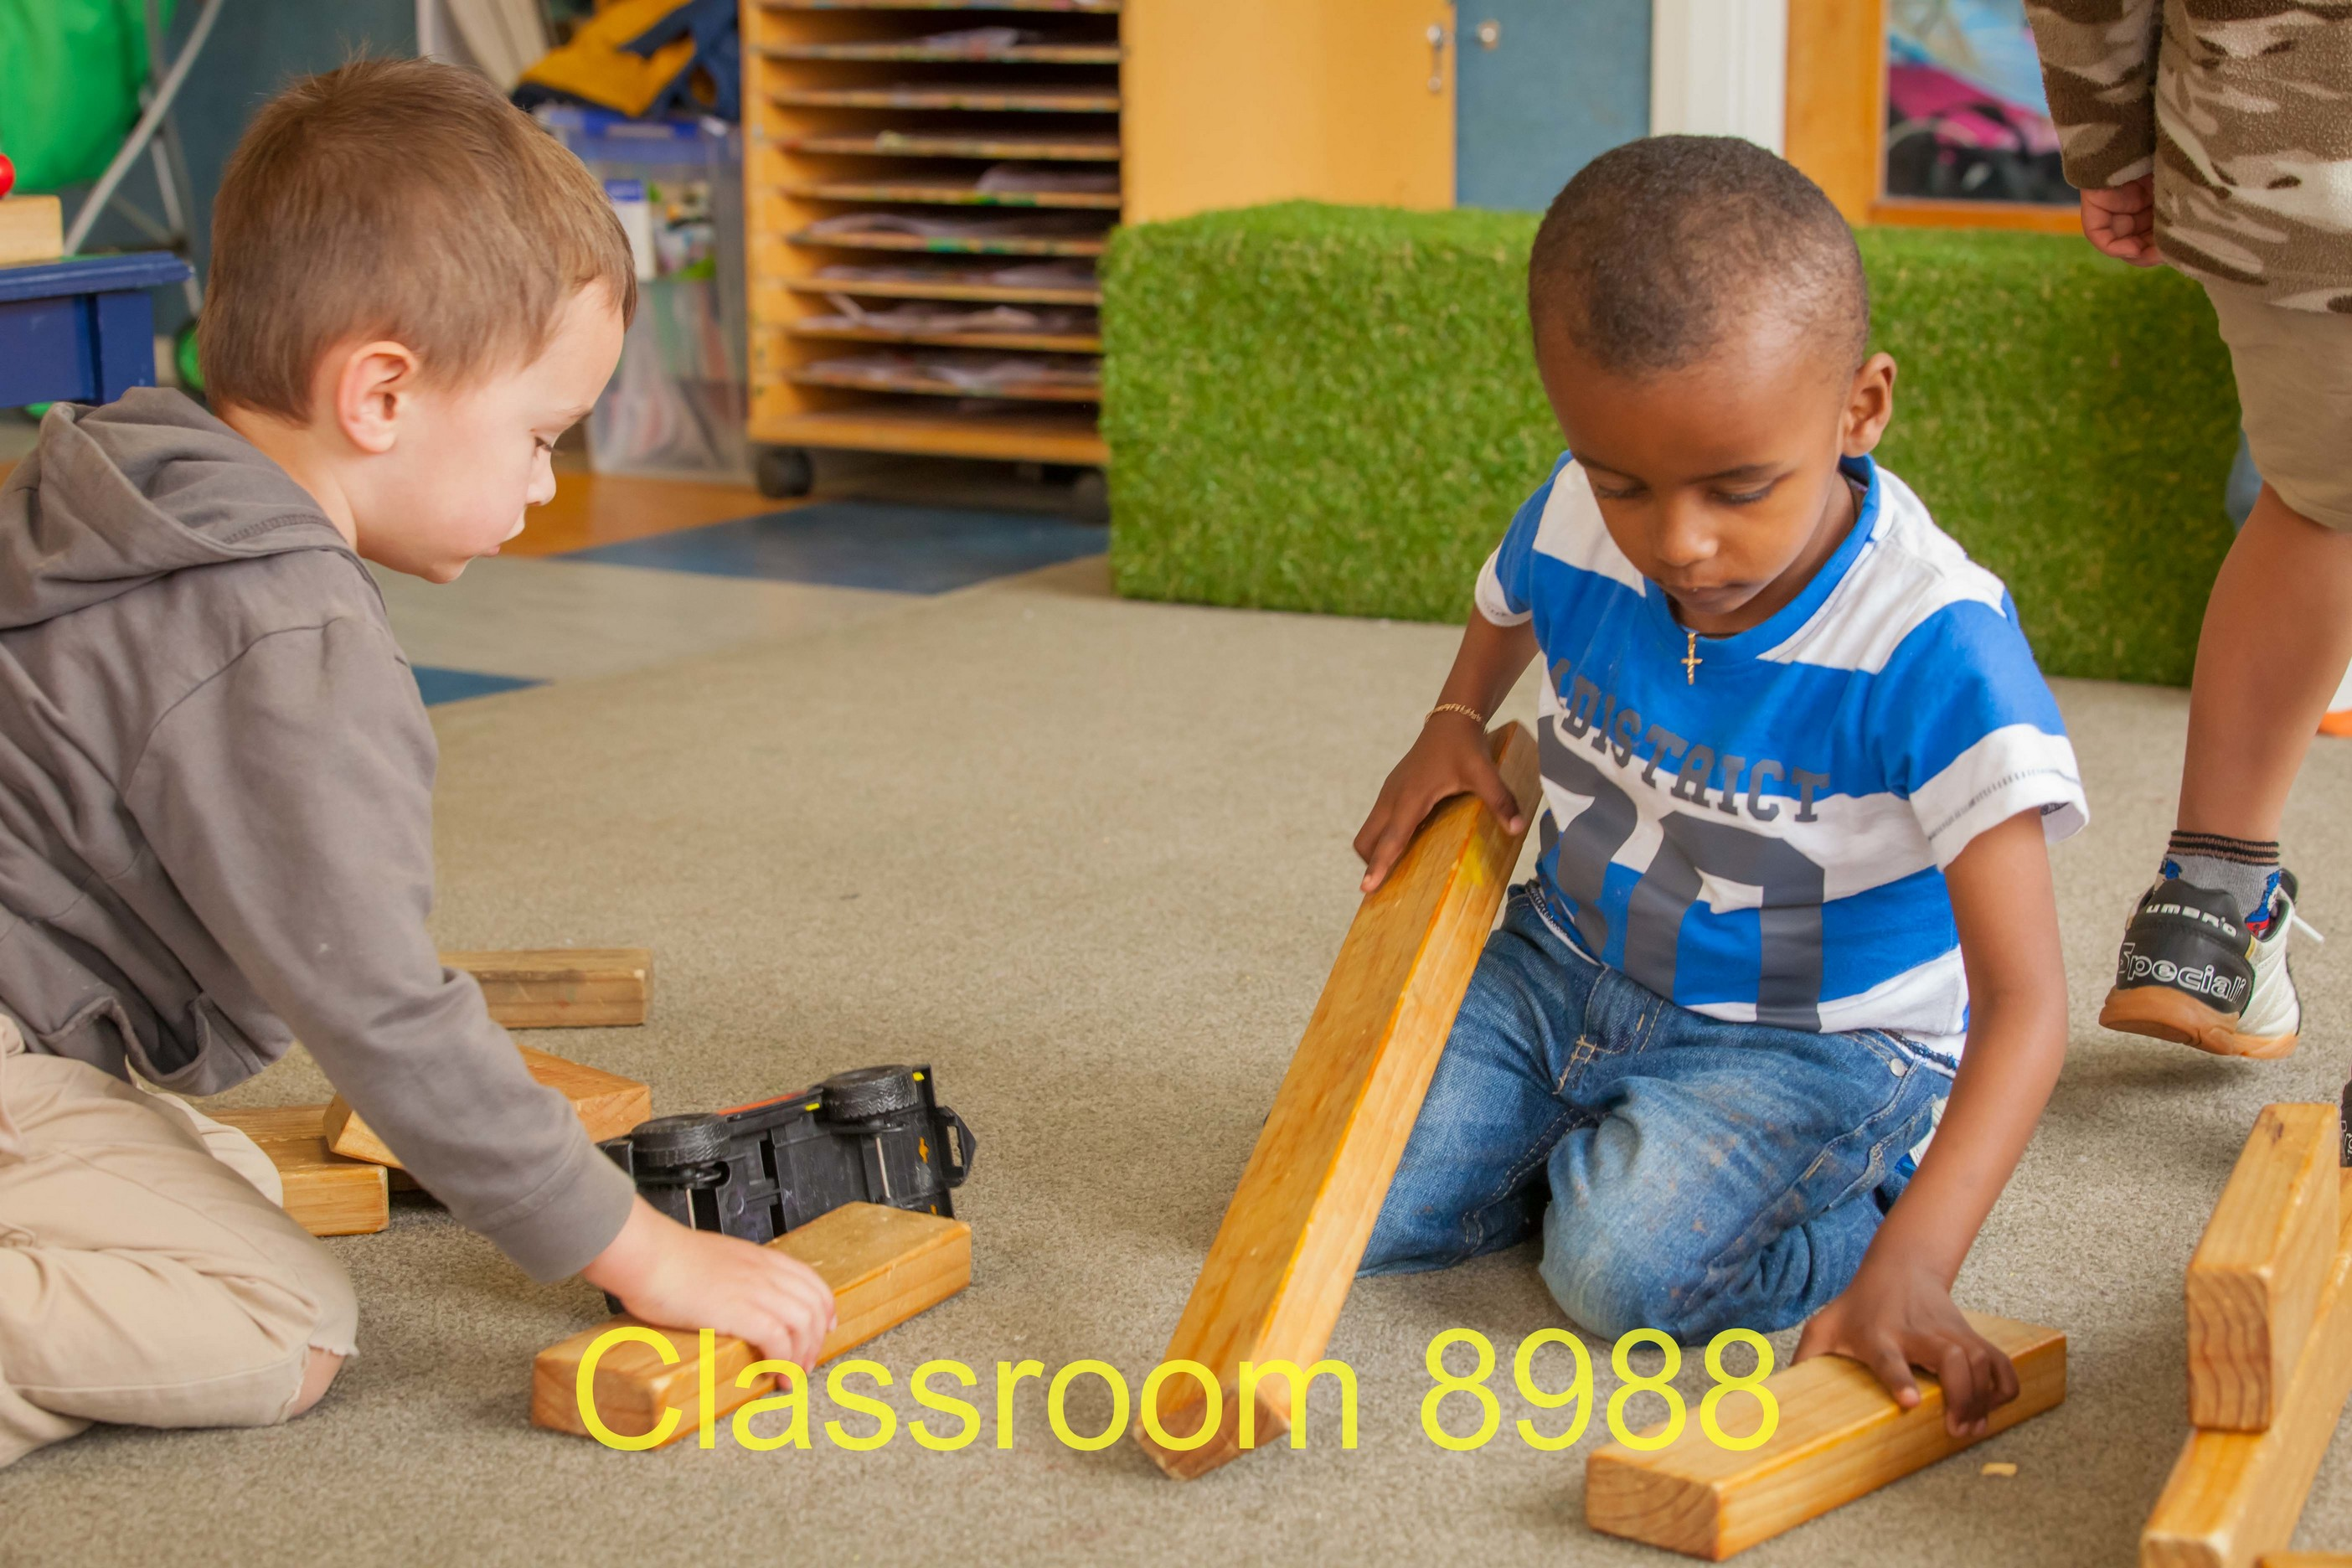 Classroom 8988